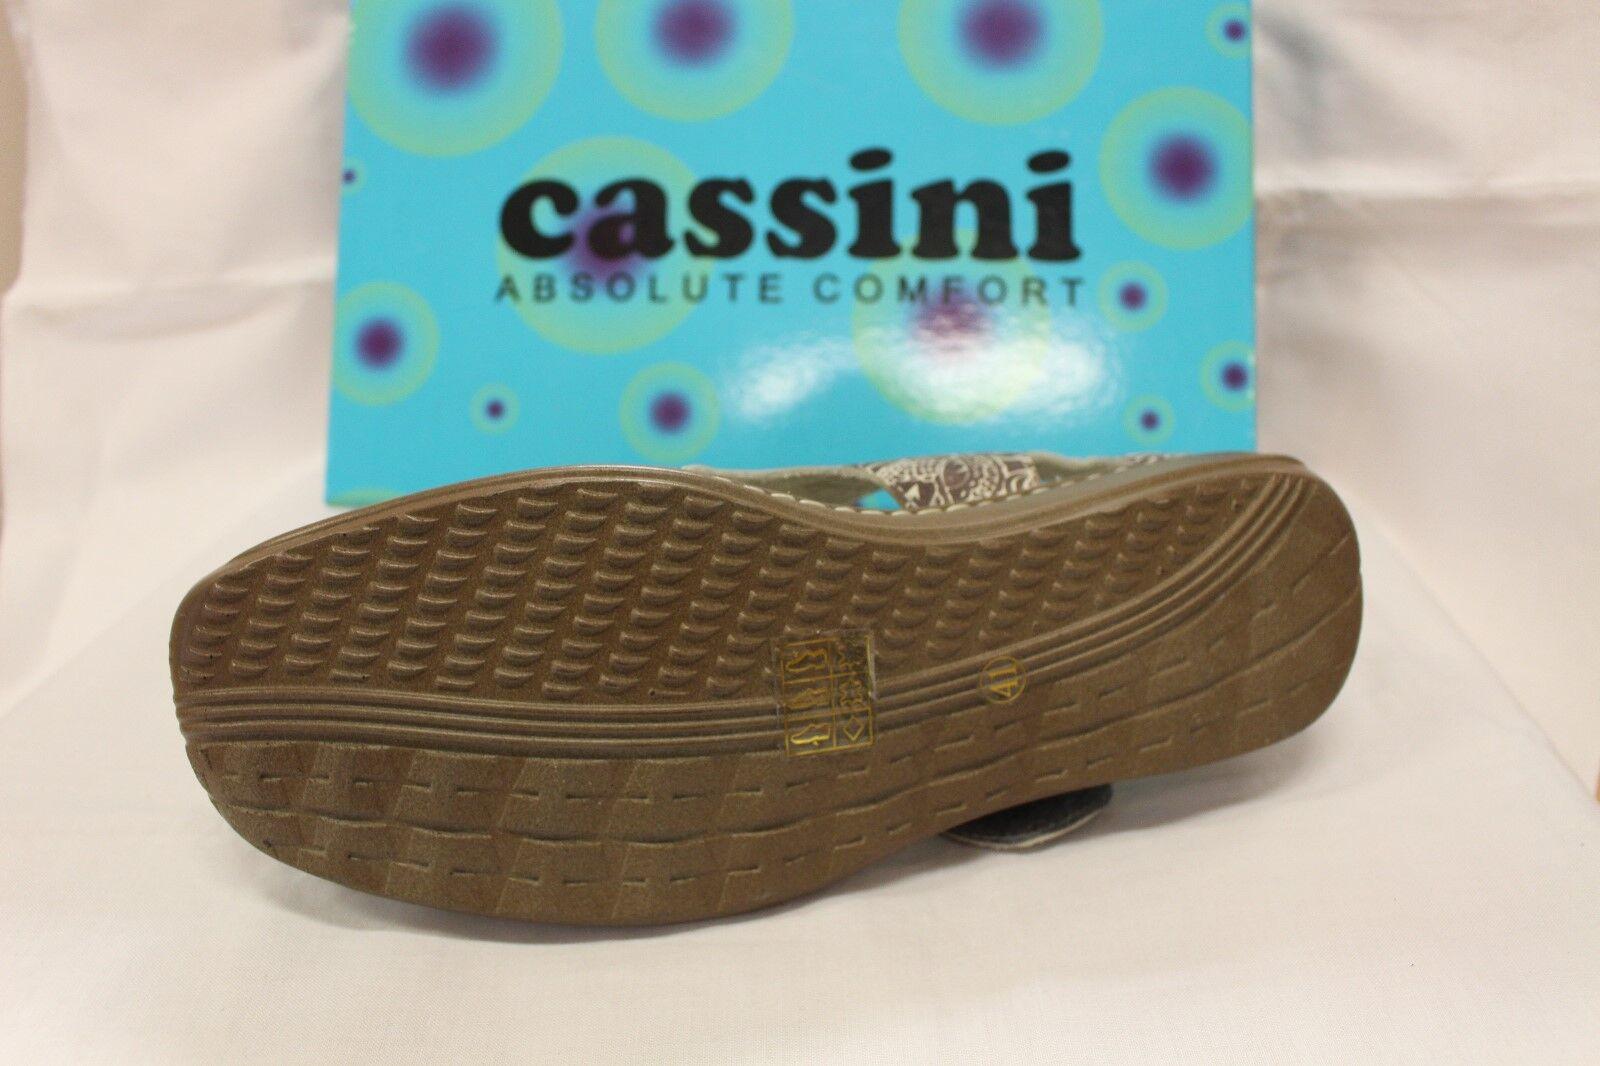 LADIES SHOES FOOTWEAR - Cassini Magic Magic Magic shoe henna 770d1c